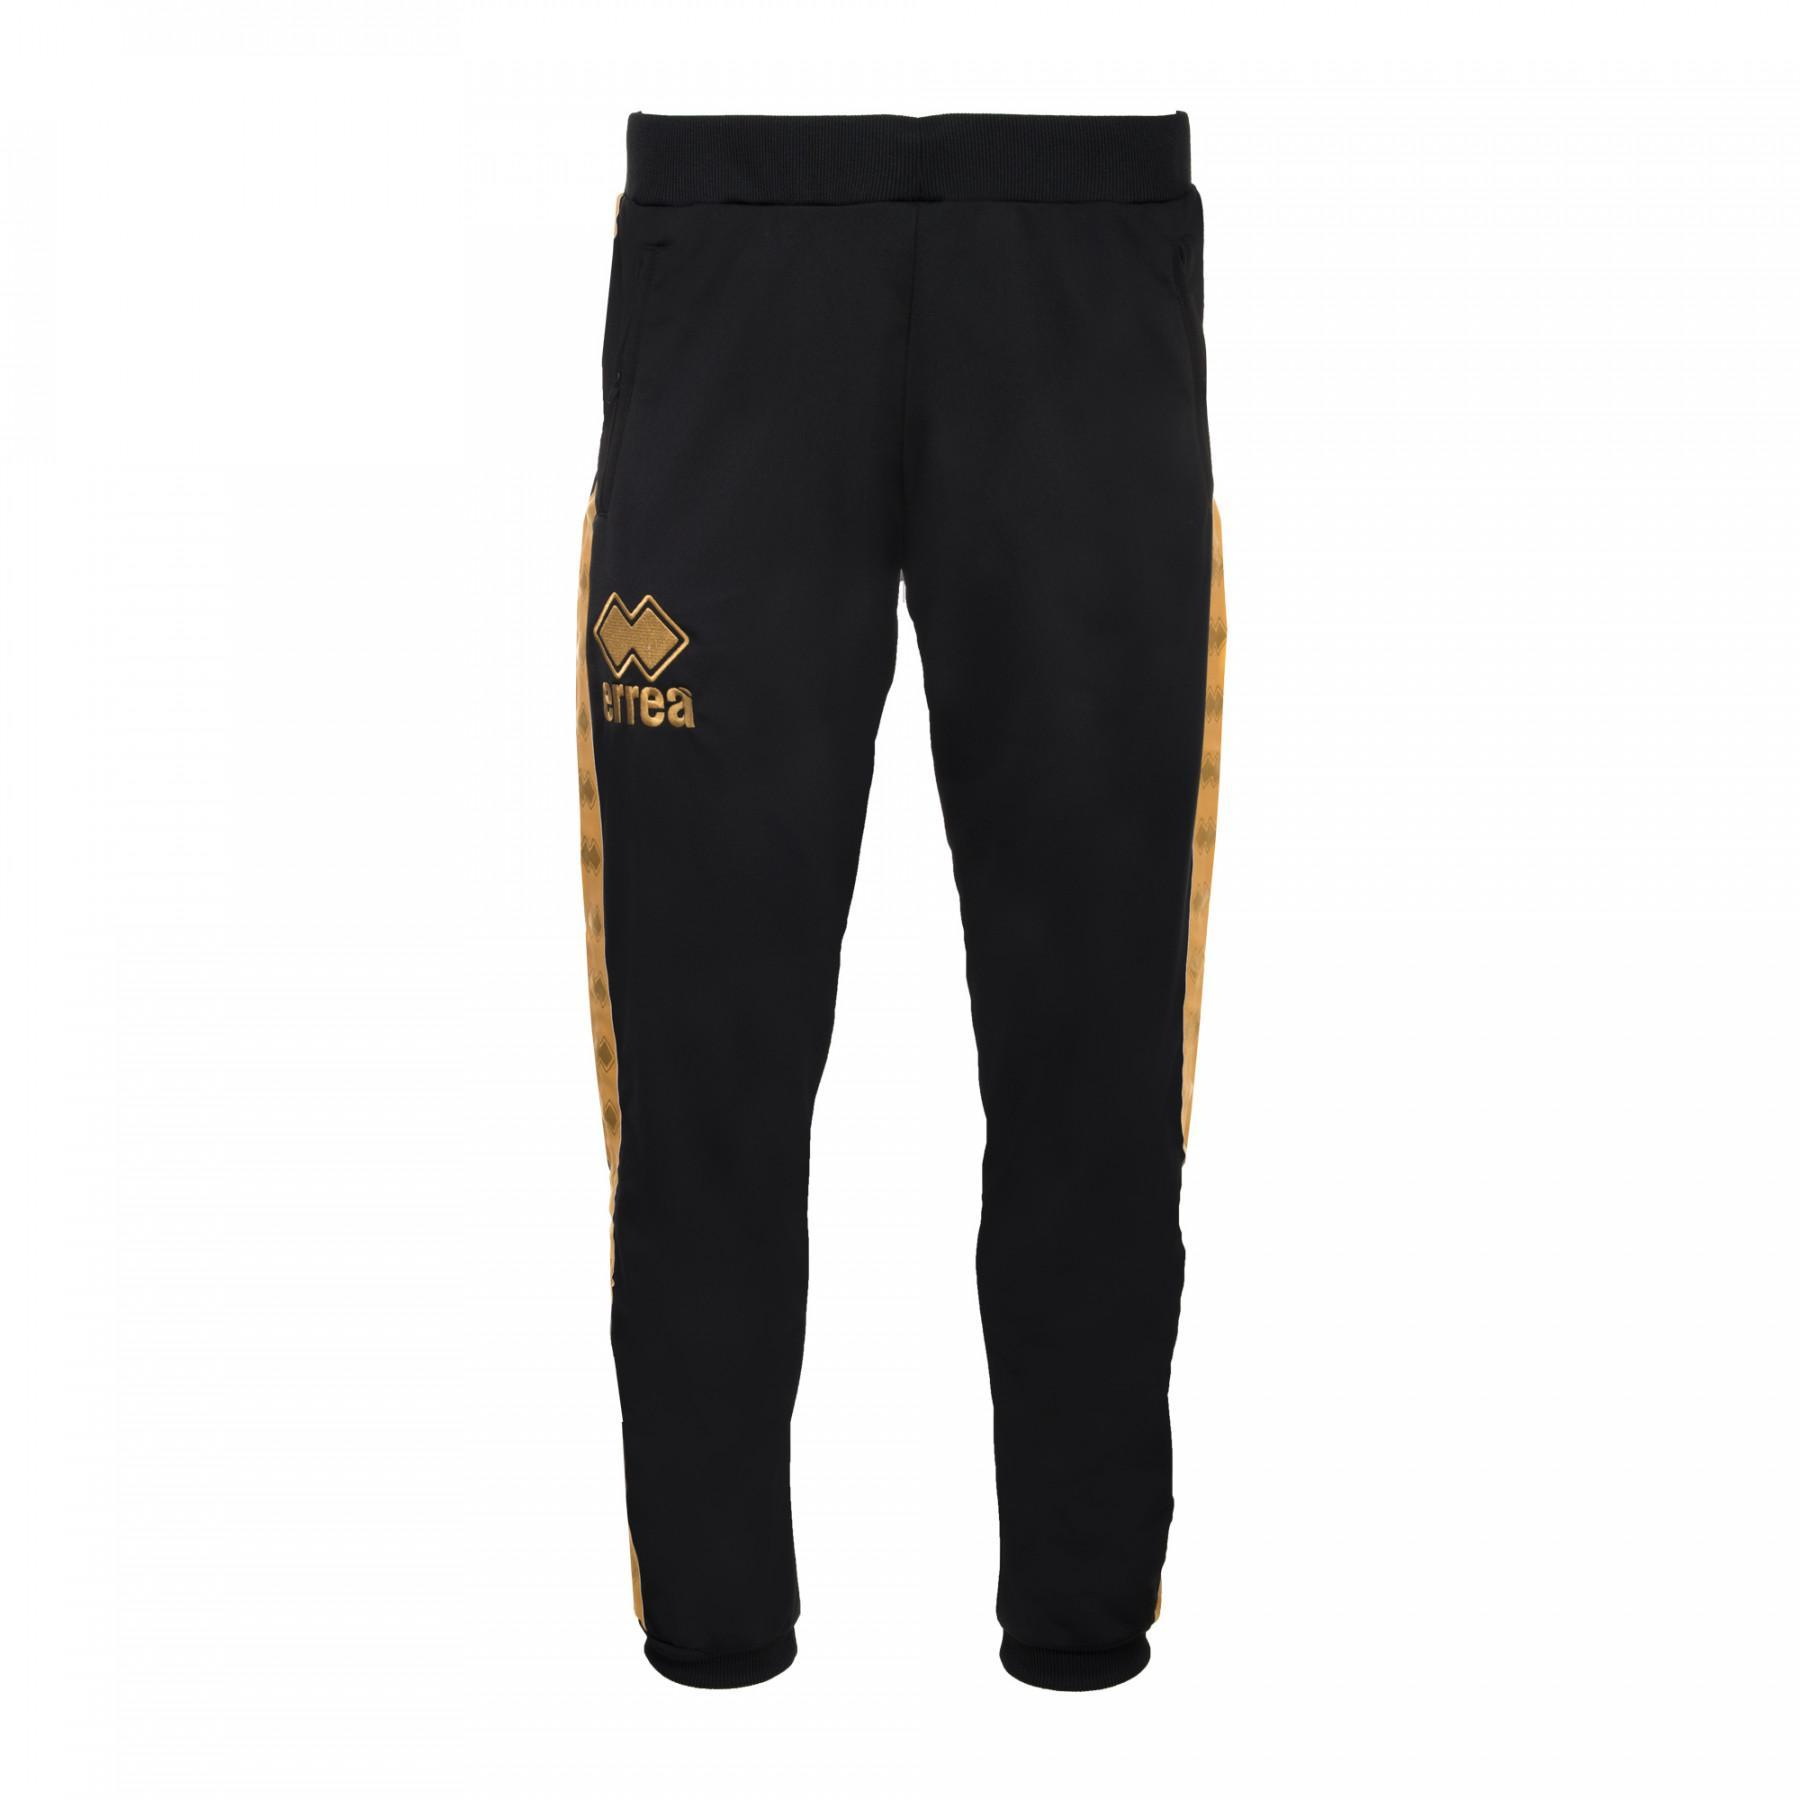 Trousers Errea essential banda 2 ad